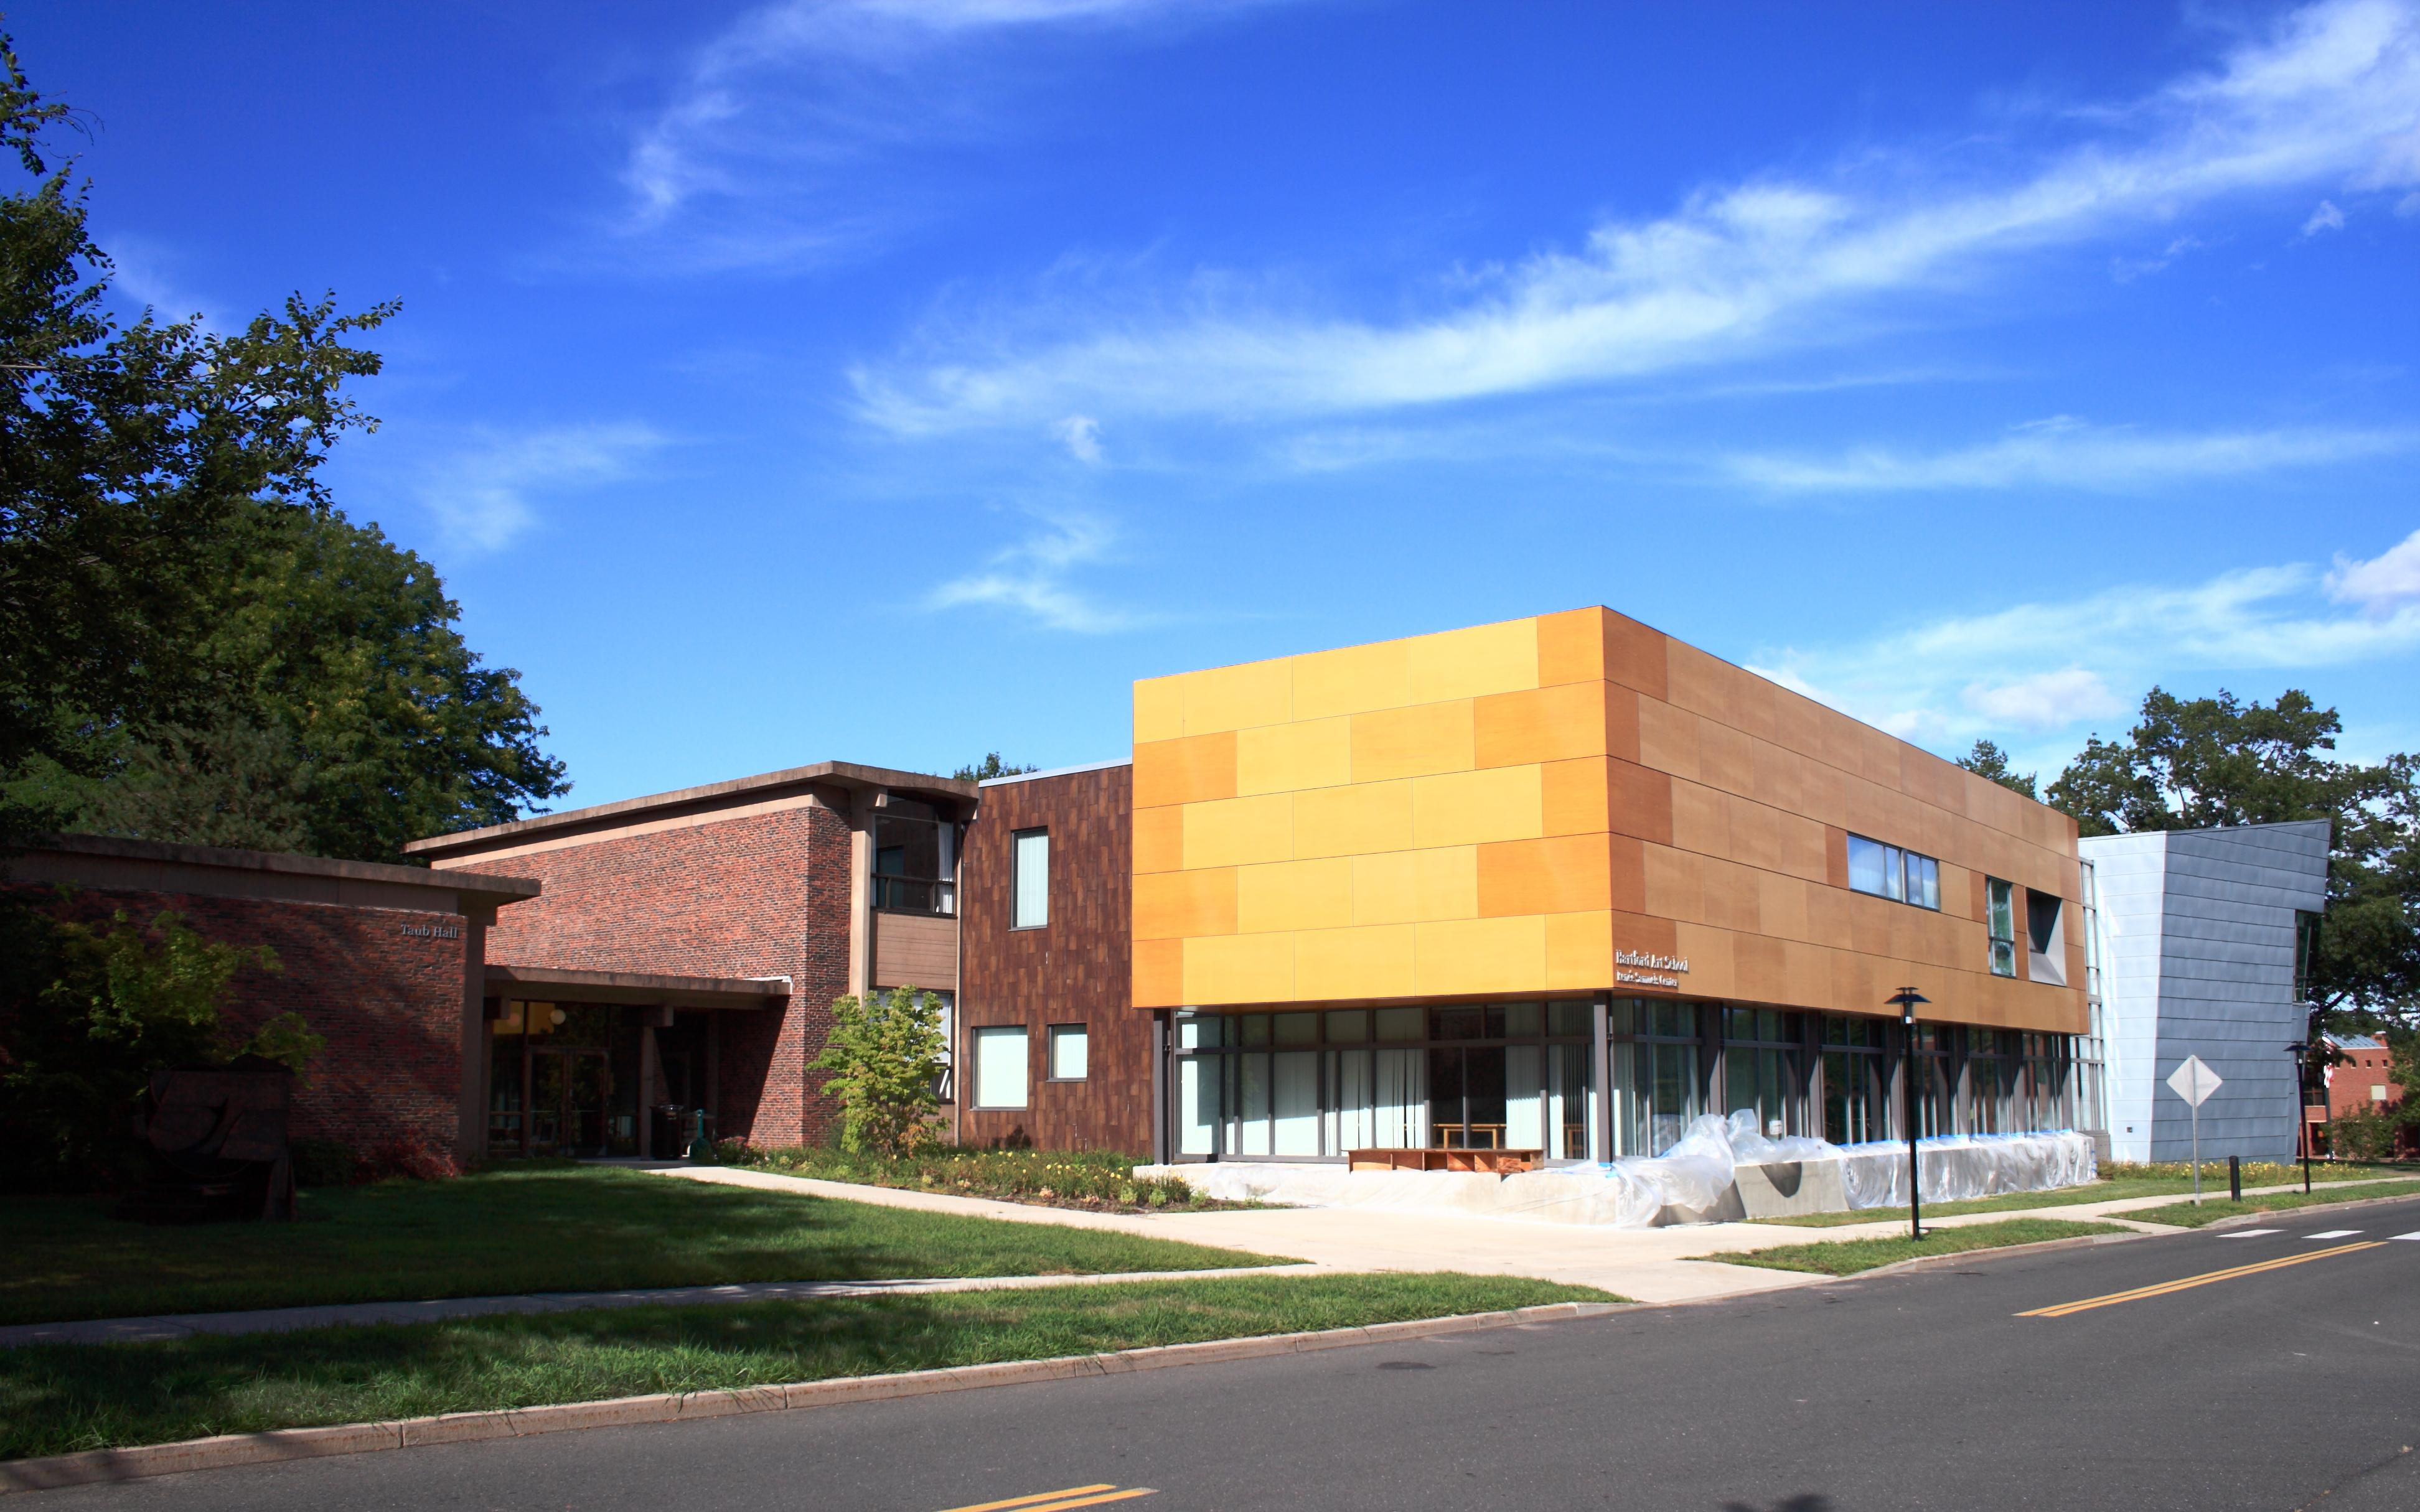 The Hartford Art School's